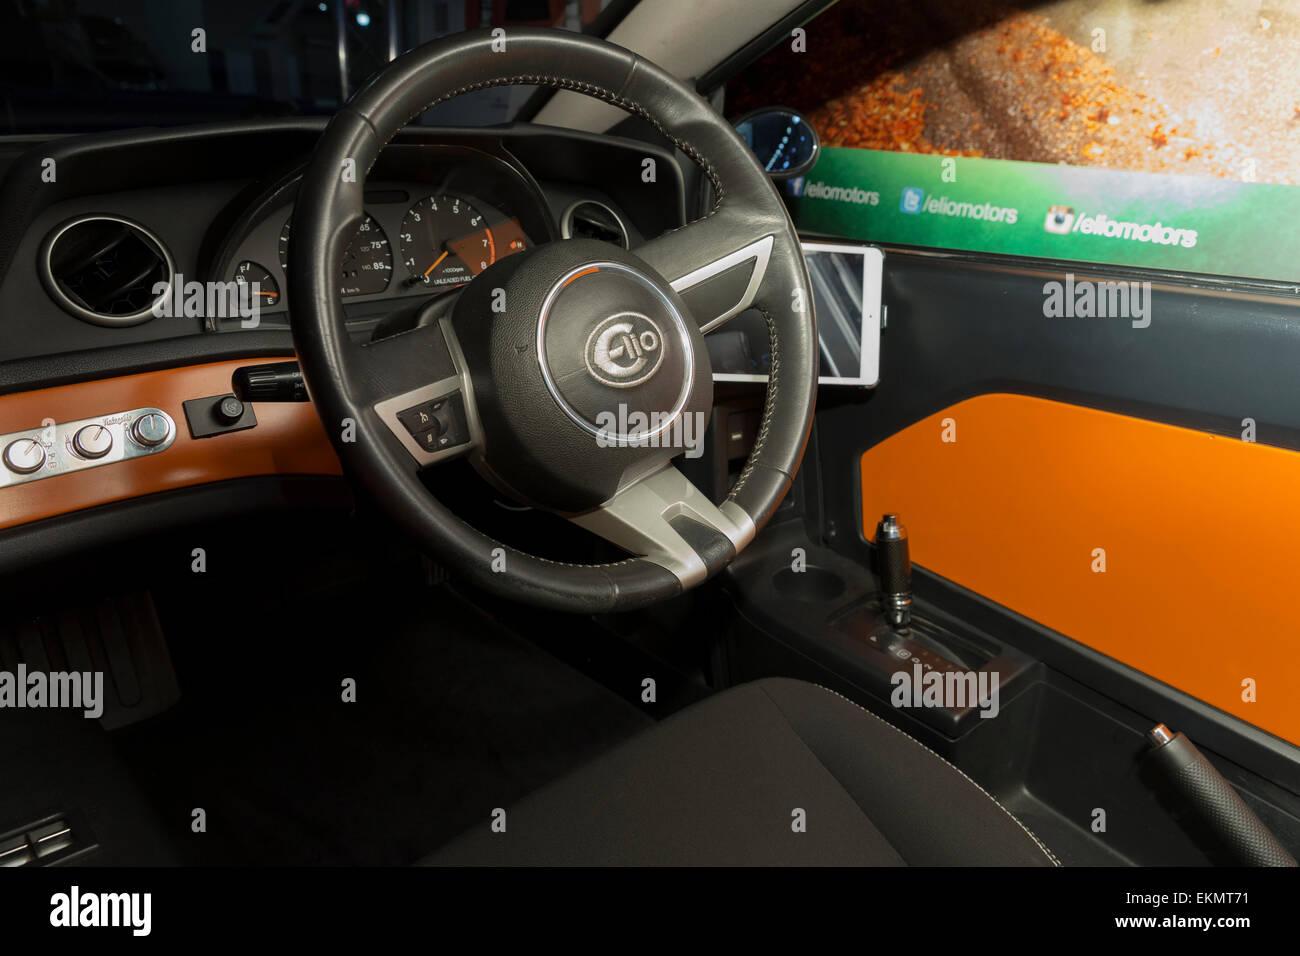 New York, NY   April 2, 2015: Interior Of Elio Electric Car On